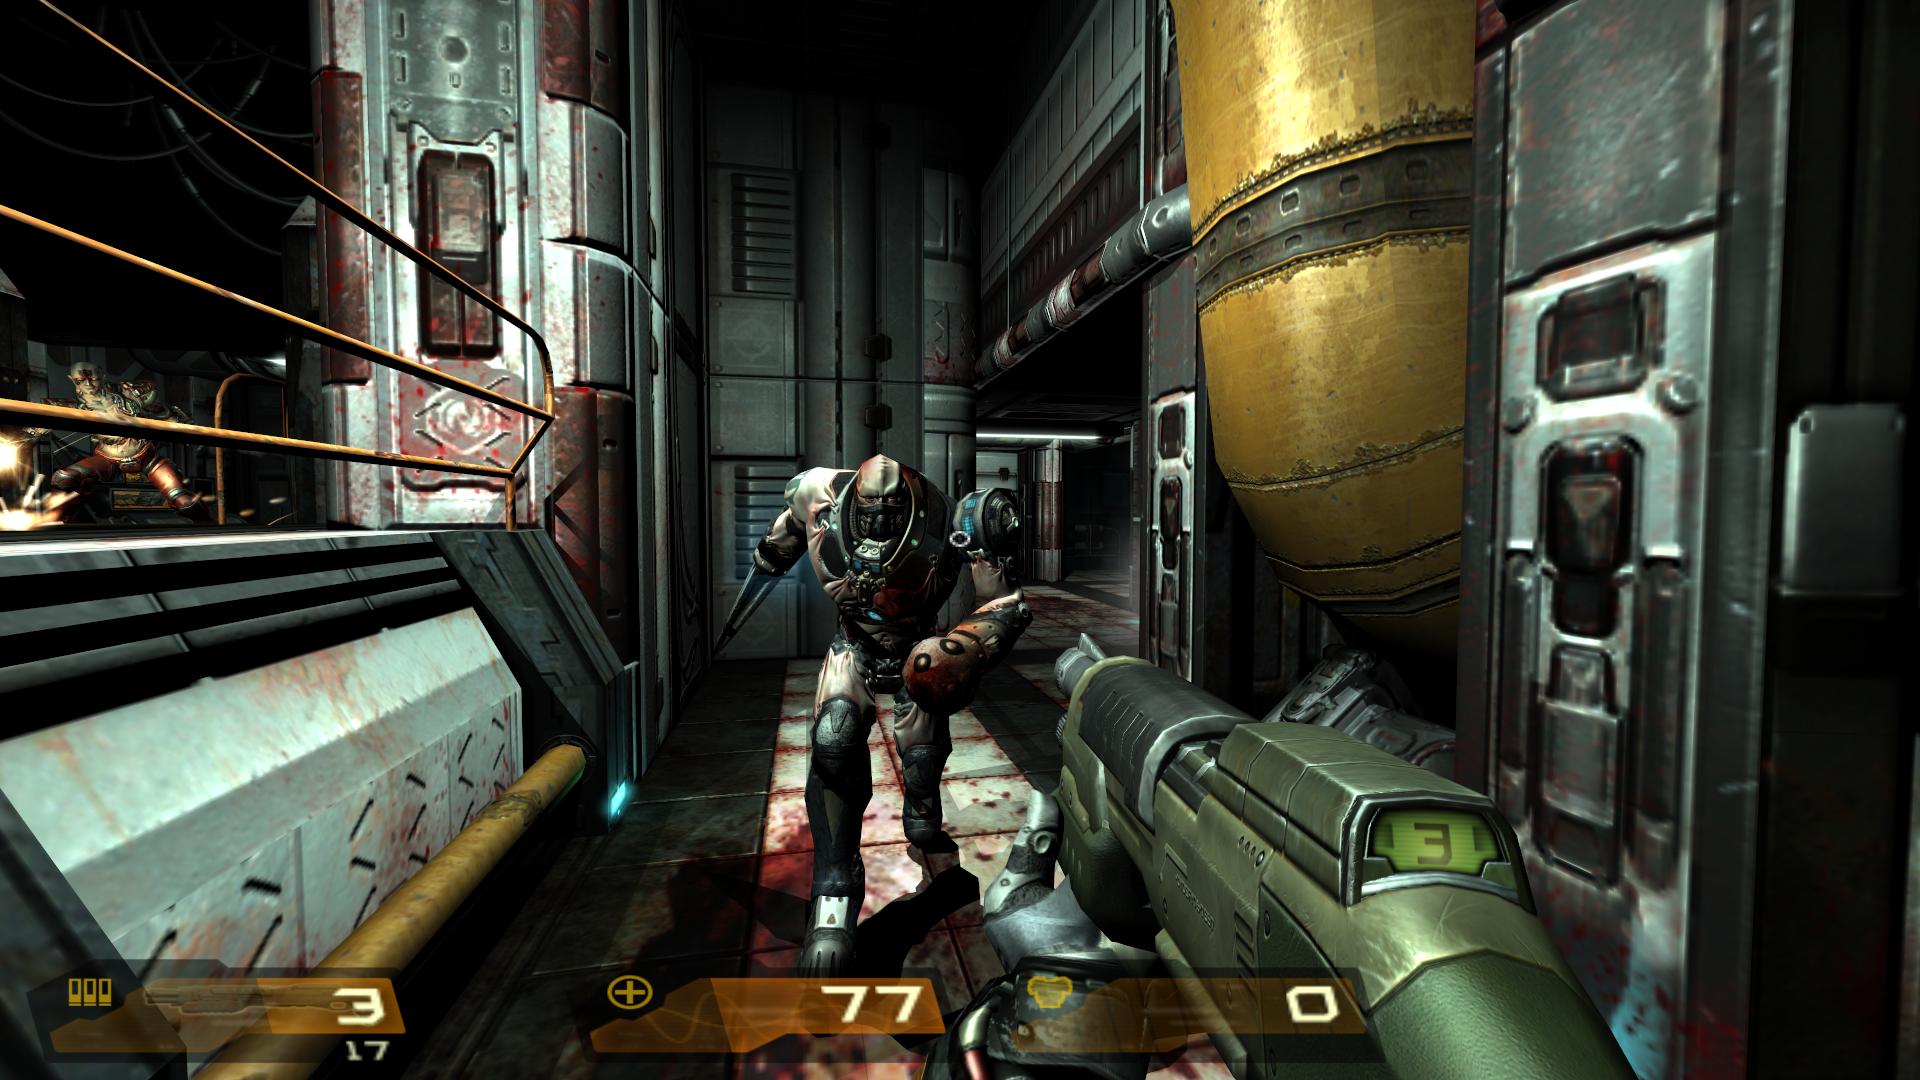 Wielding a shotgun, the player is charged by a 'Berserker' Strogg.